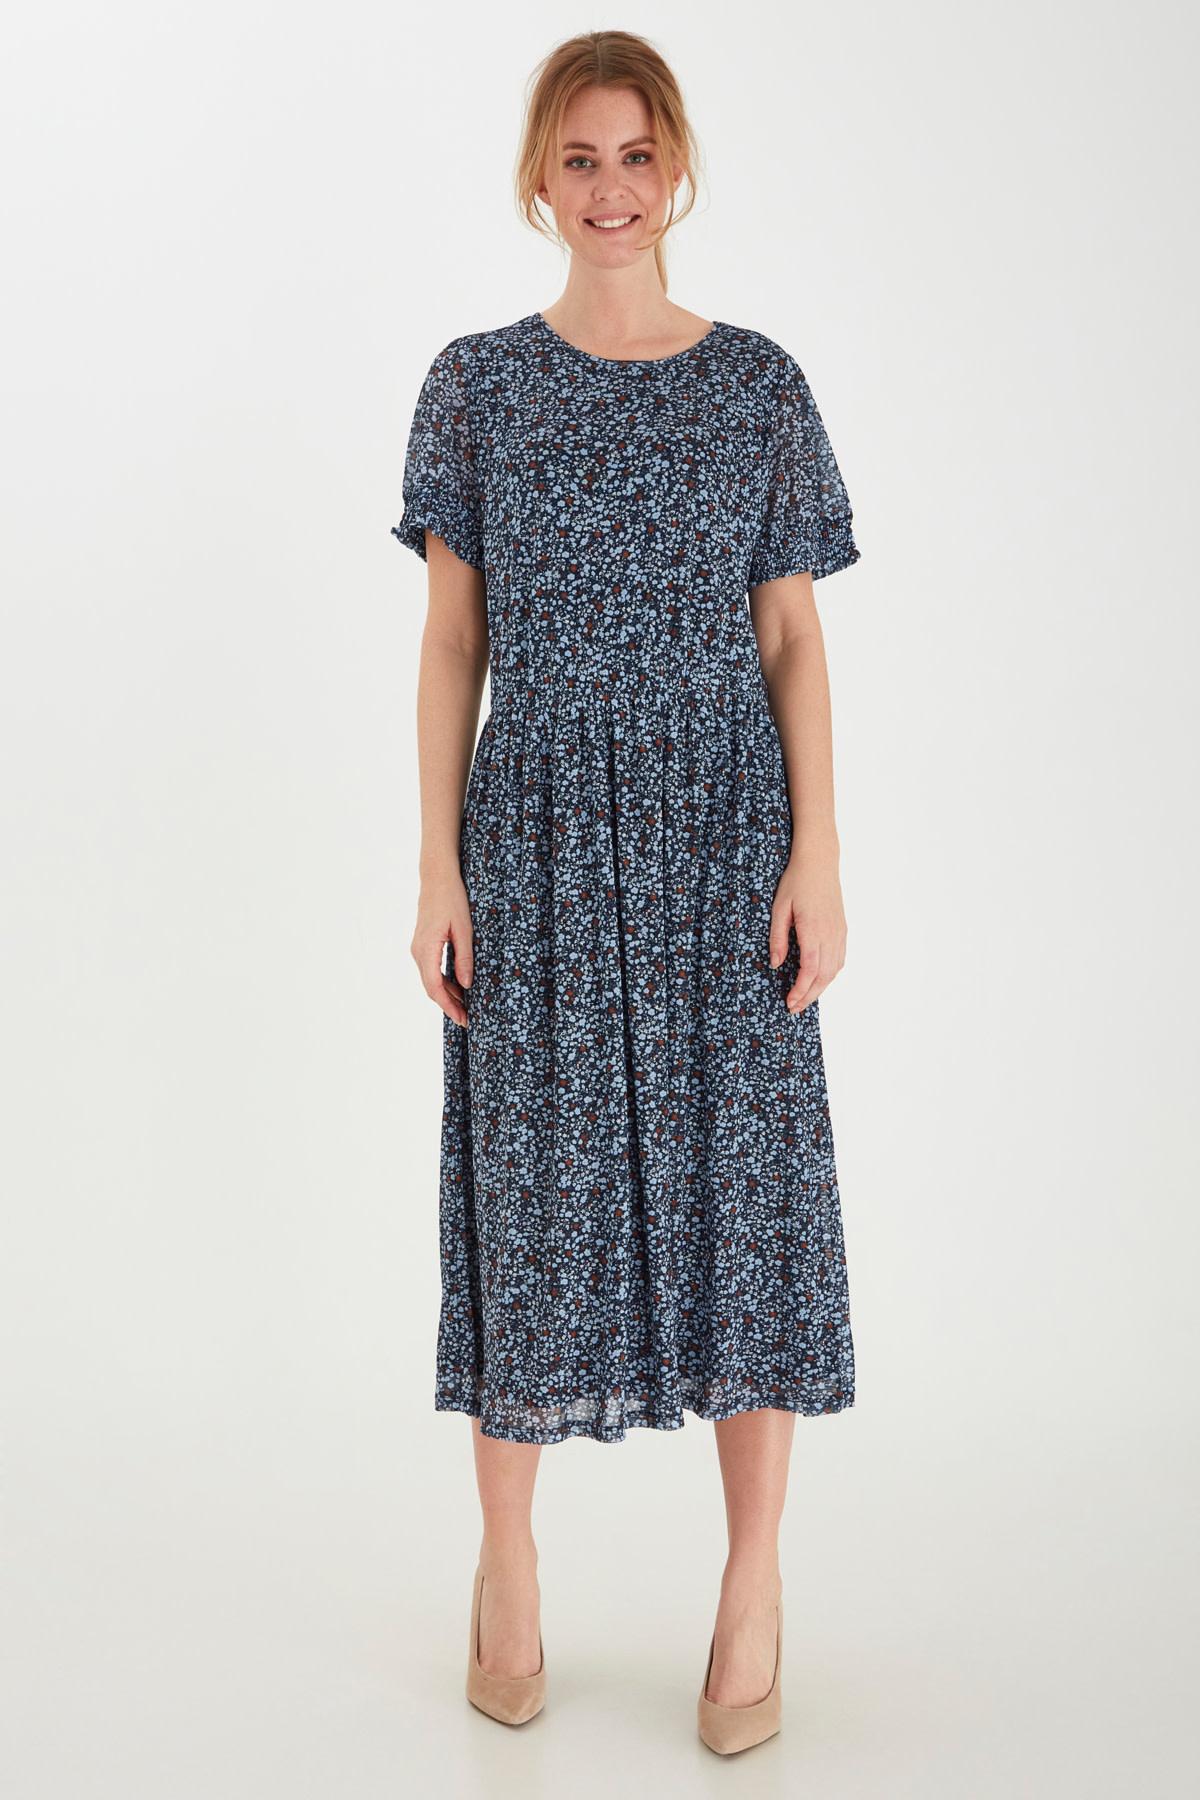 Mesh Floral Dress